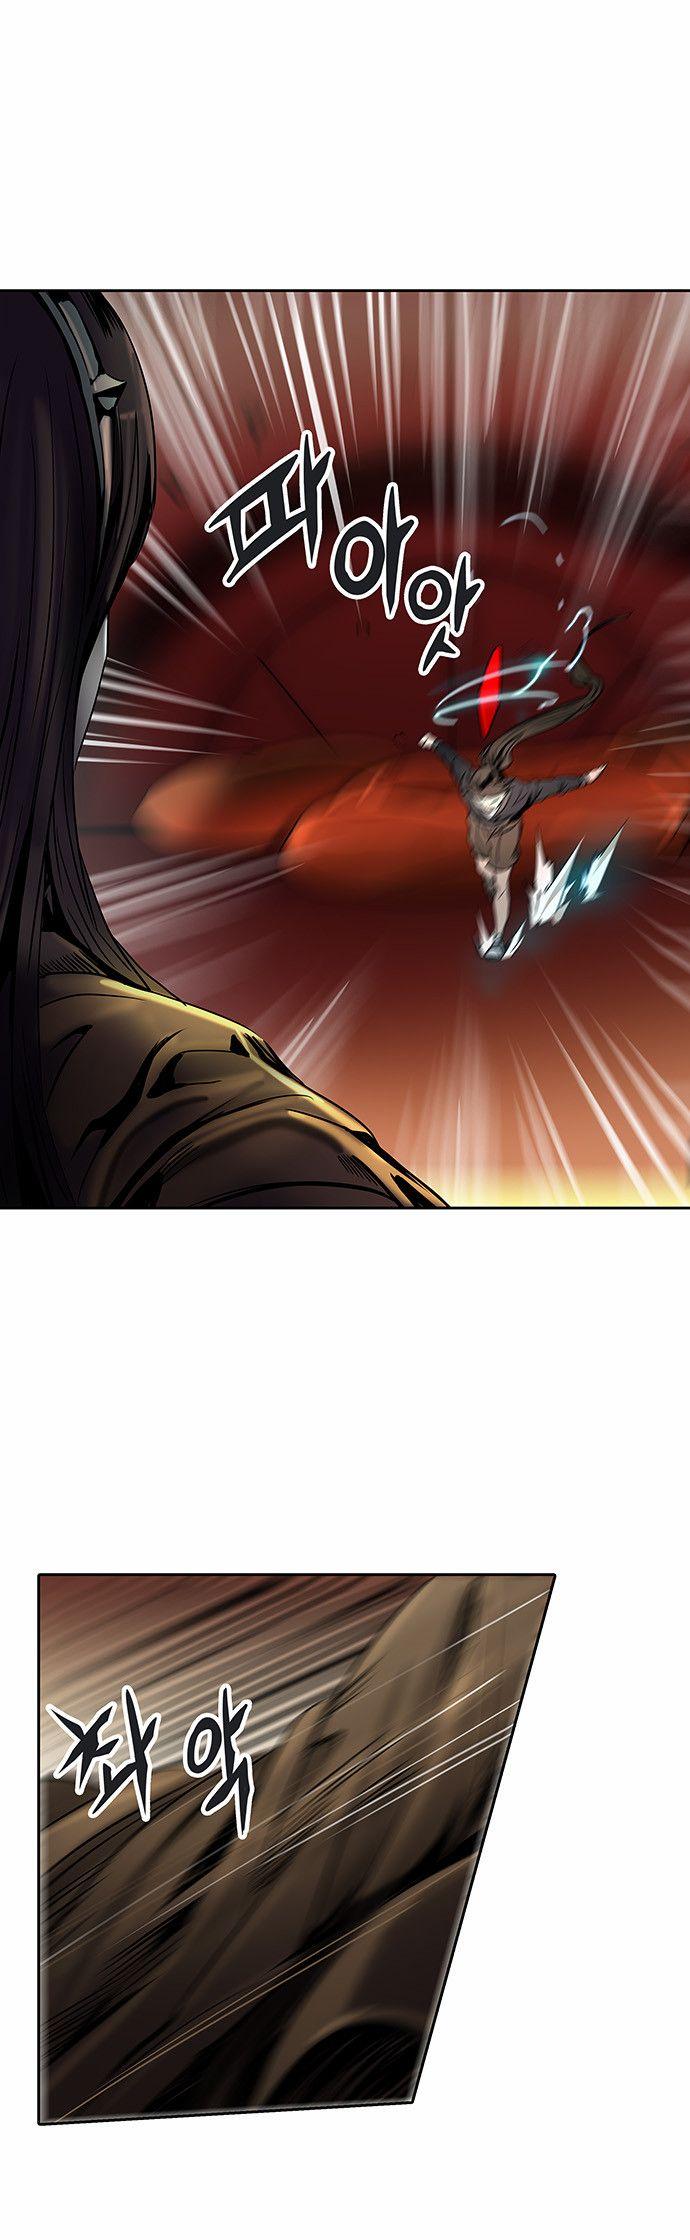 http://c5.ninemanga.com/es_manga/pic2/21/149/503715/d0095d3cd2f747ab23126a366739afb5.jpg Page 8